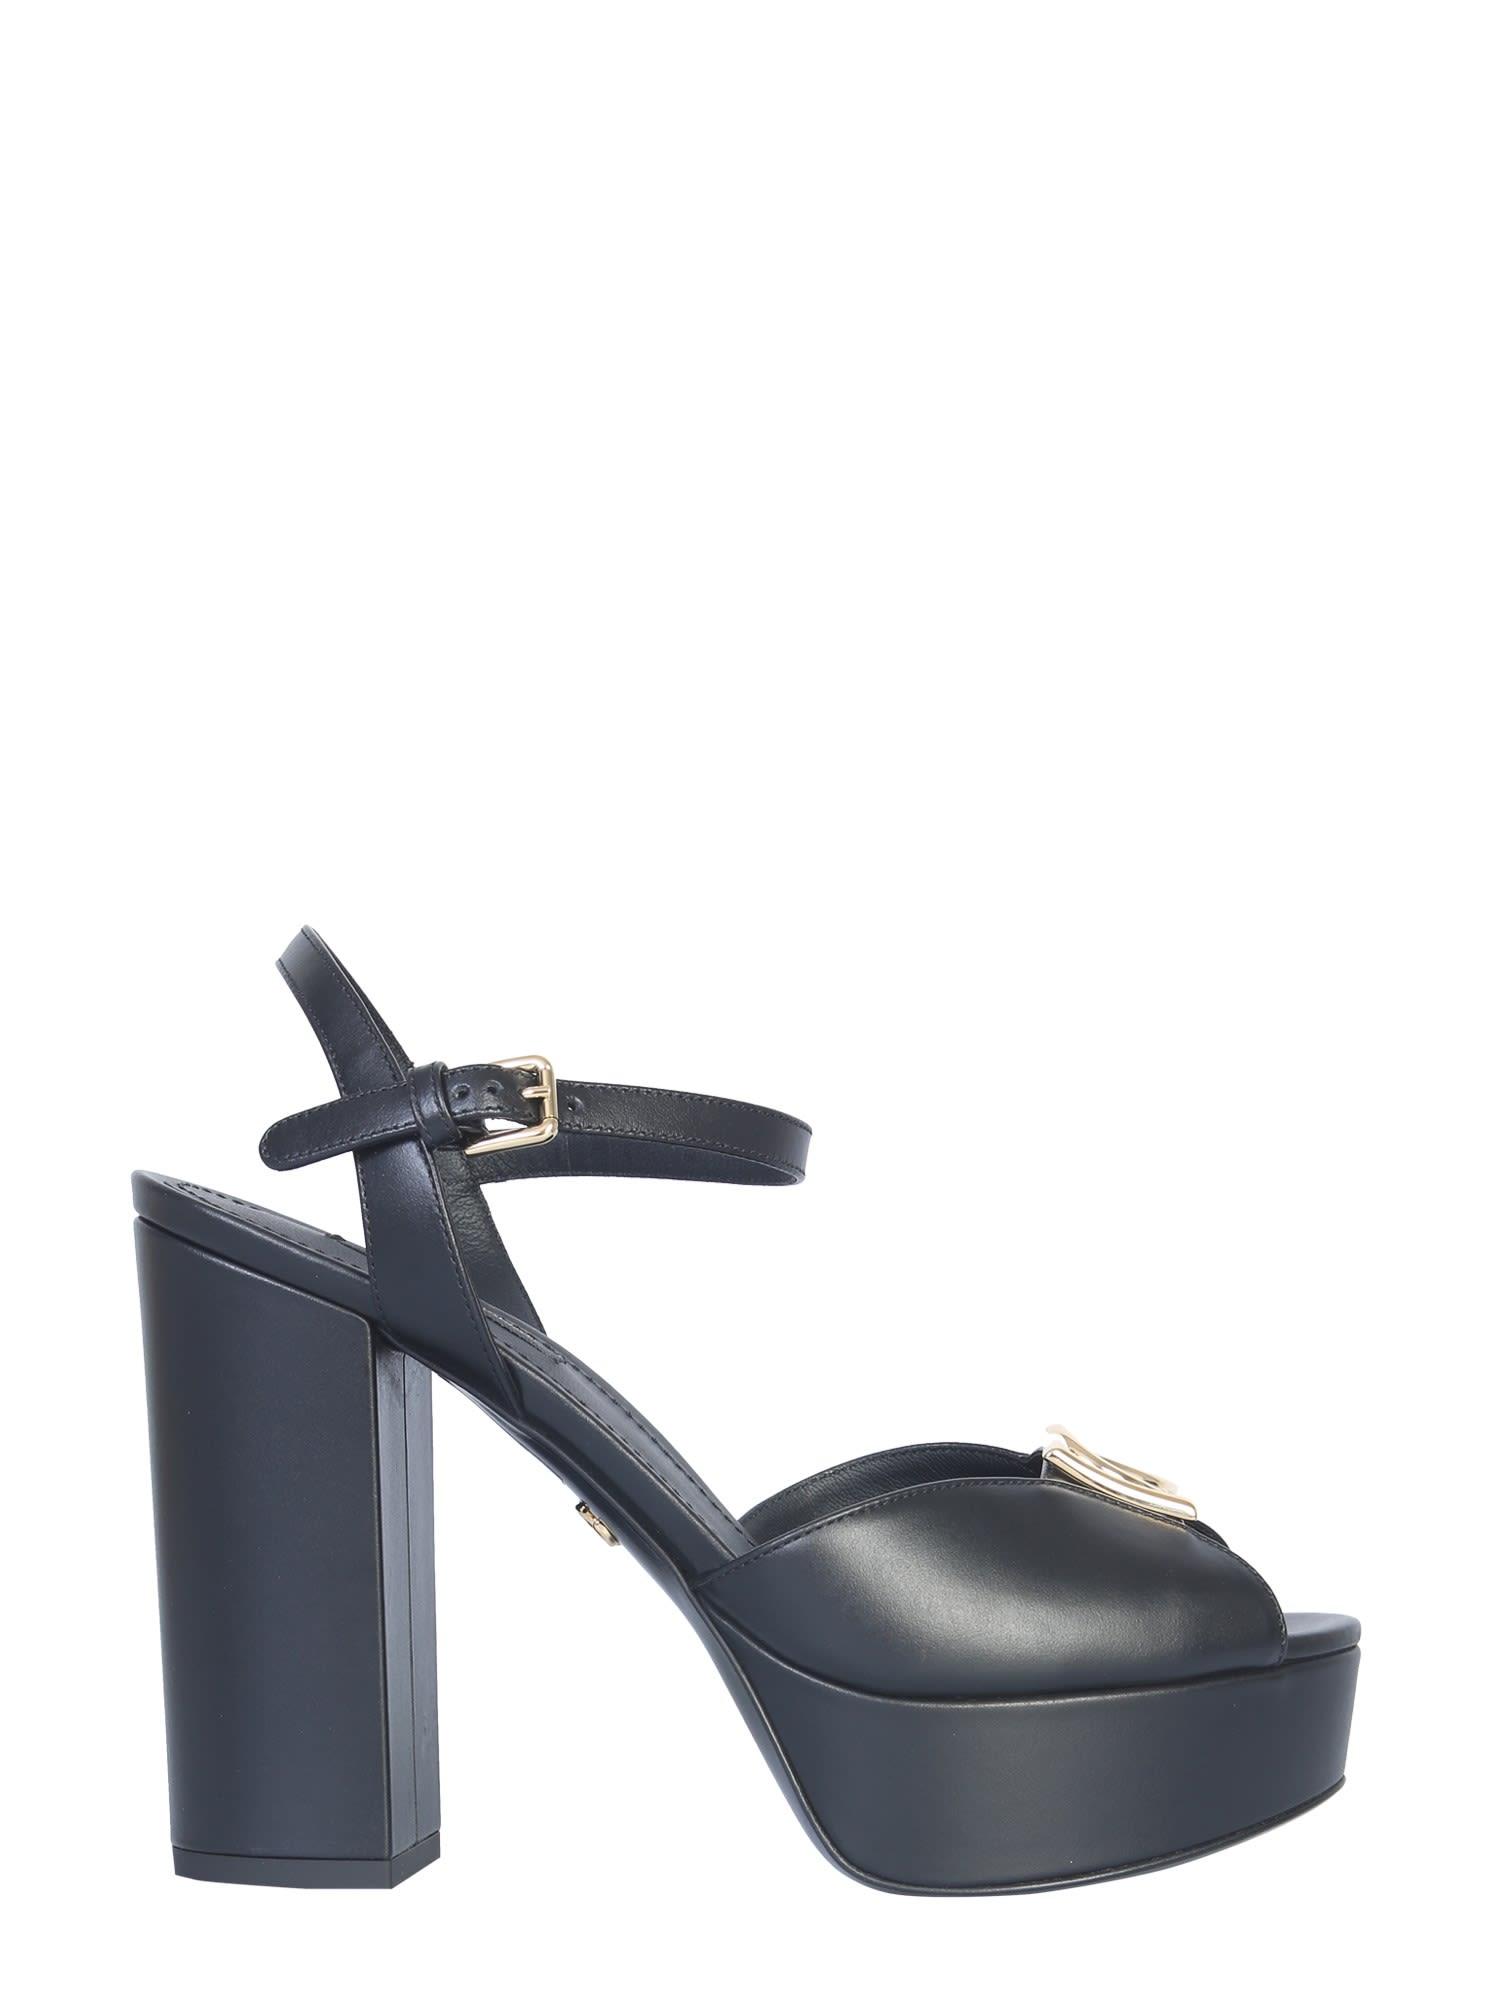 Dolce & Gabbana Sandal With Plateau